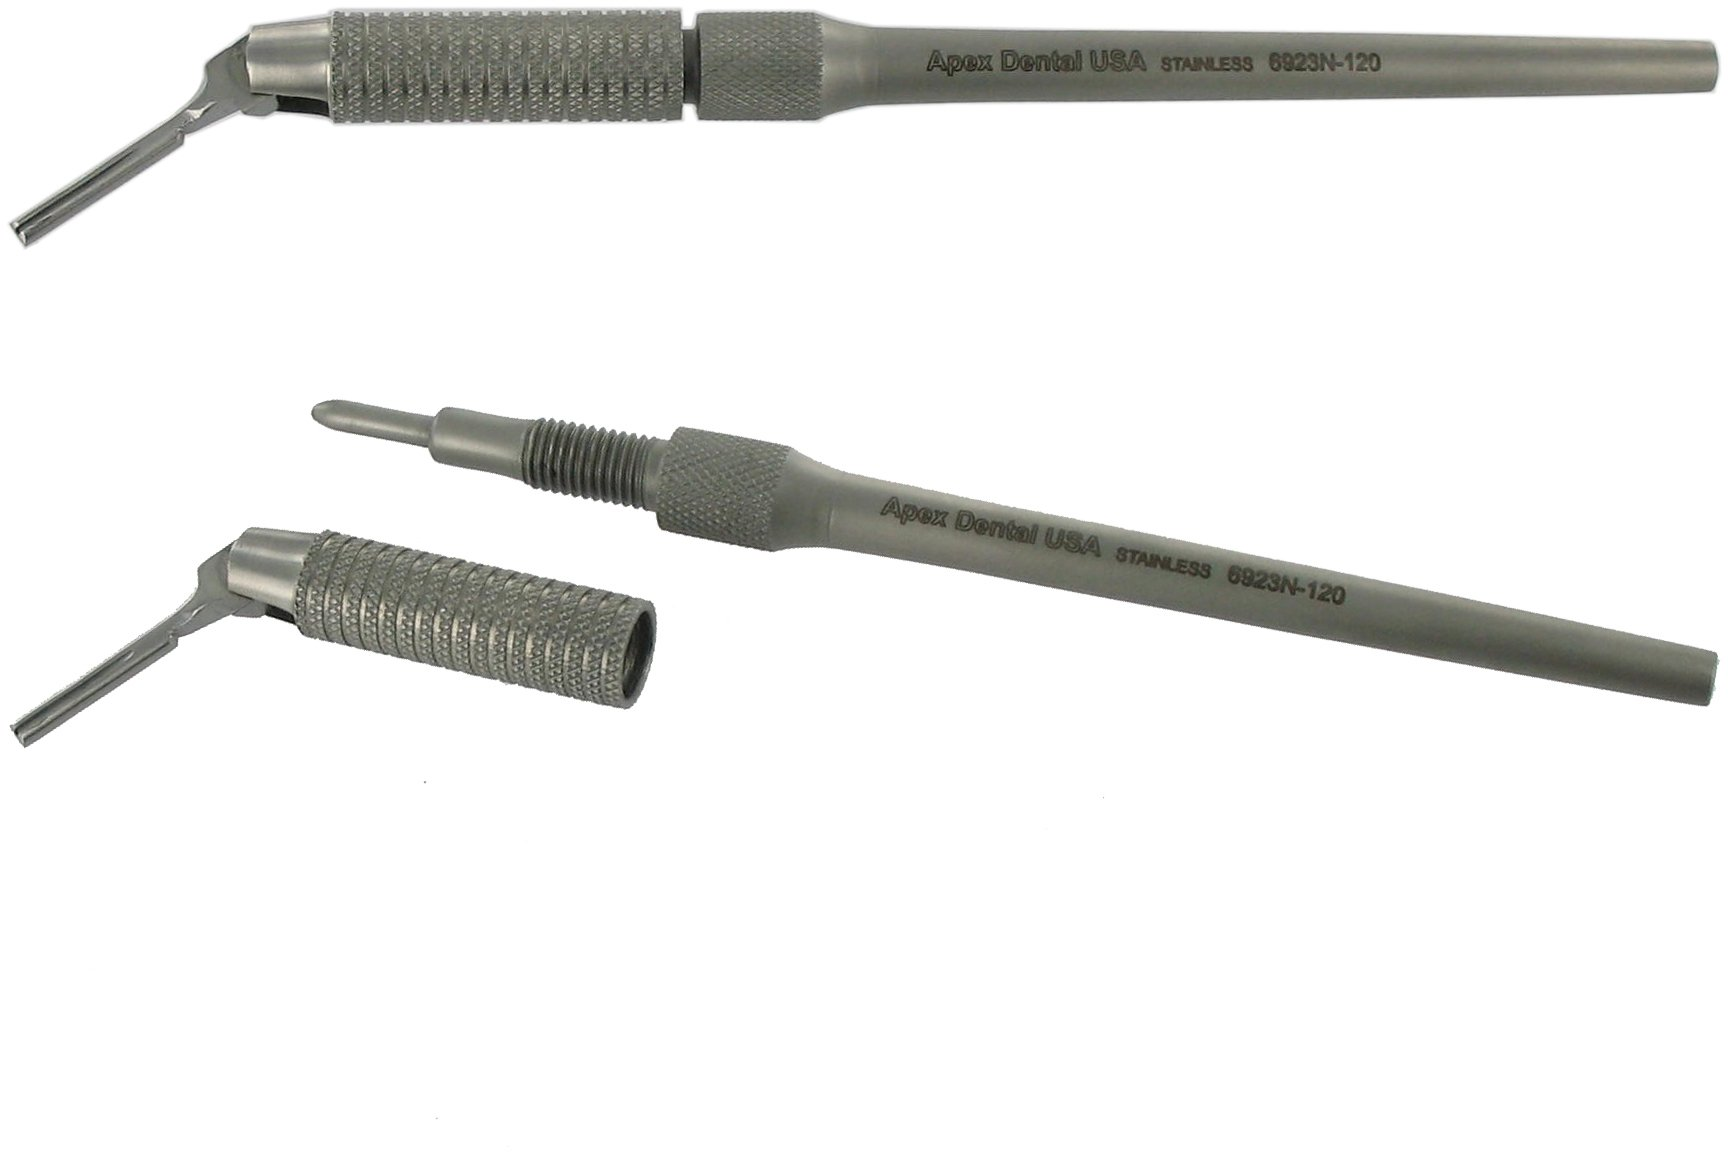 Dental USA 6923 Scalpel Handle Adjustable